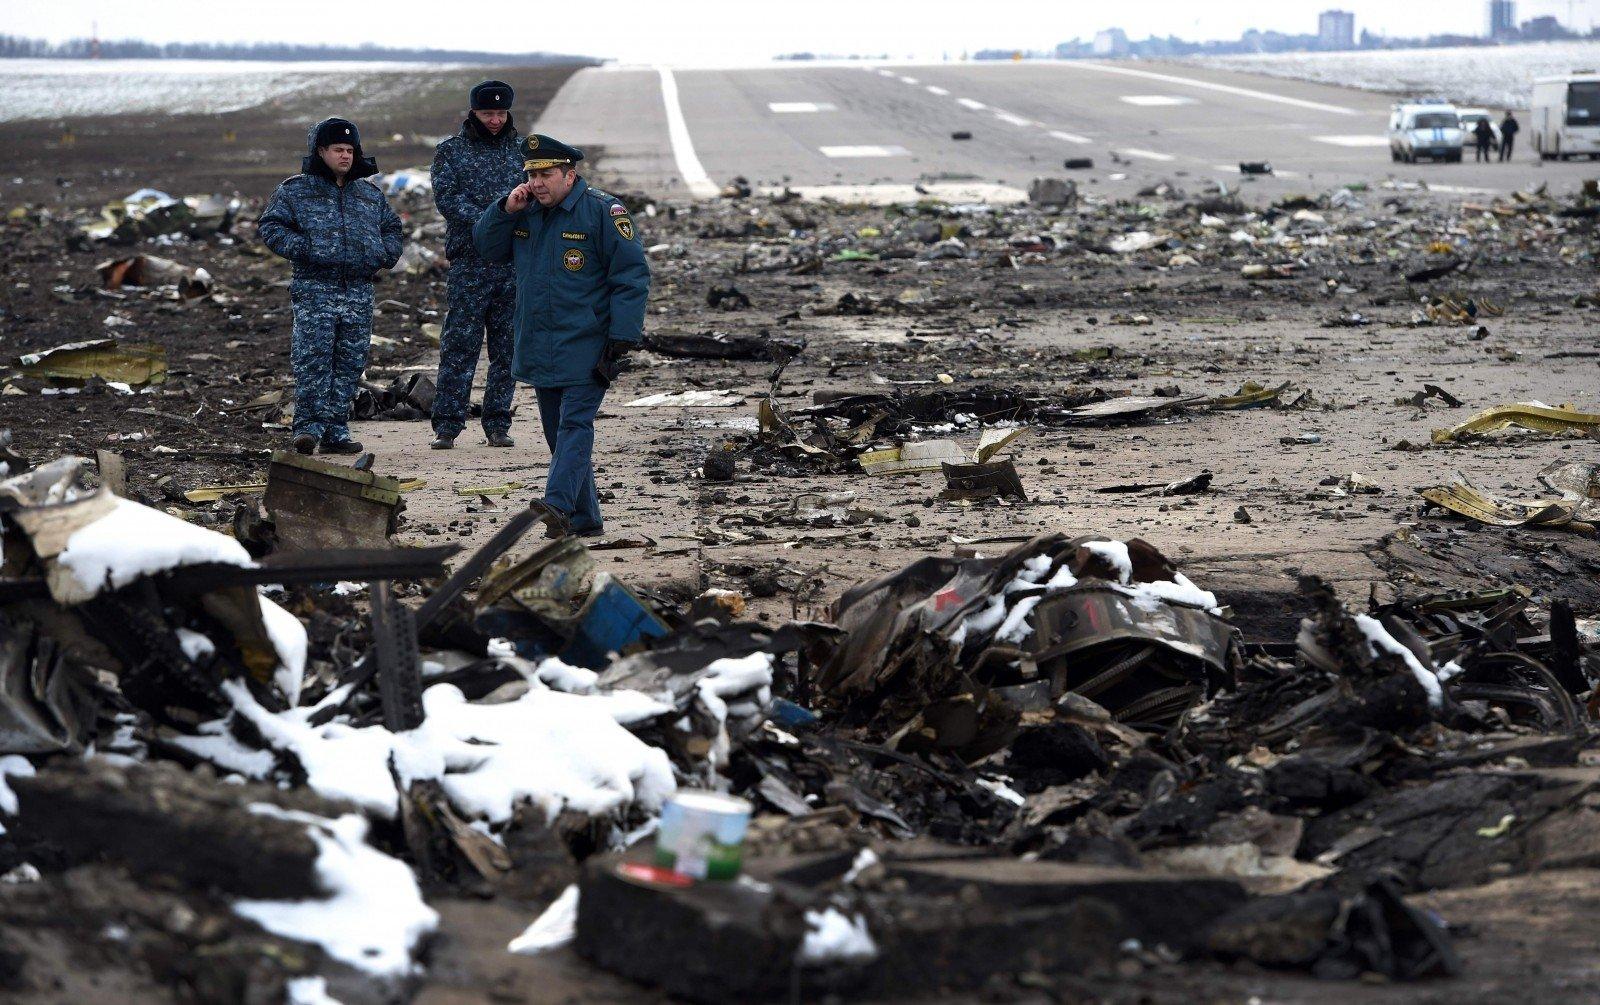 крушение самолета в ростове сегодня фото